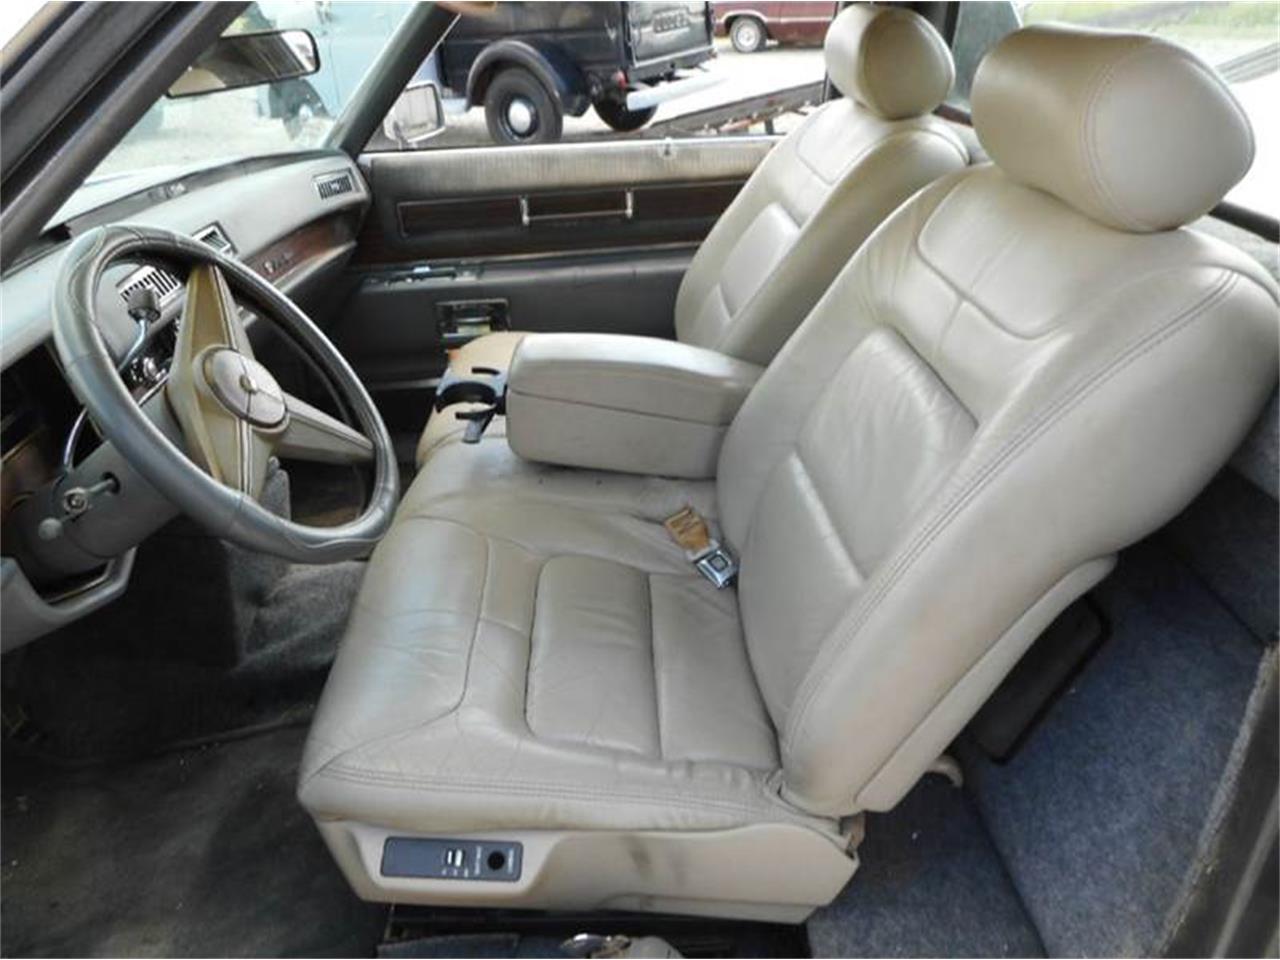 Large Picture of 1976 Cadillac 4-Dr Sedan located in Staunton Illinois - L8QX